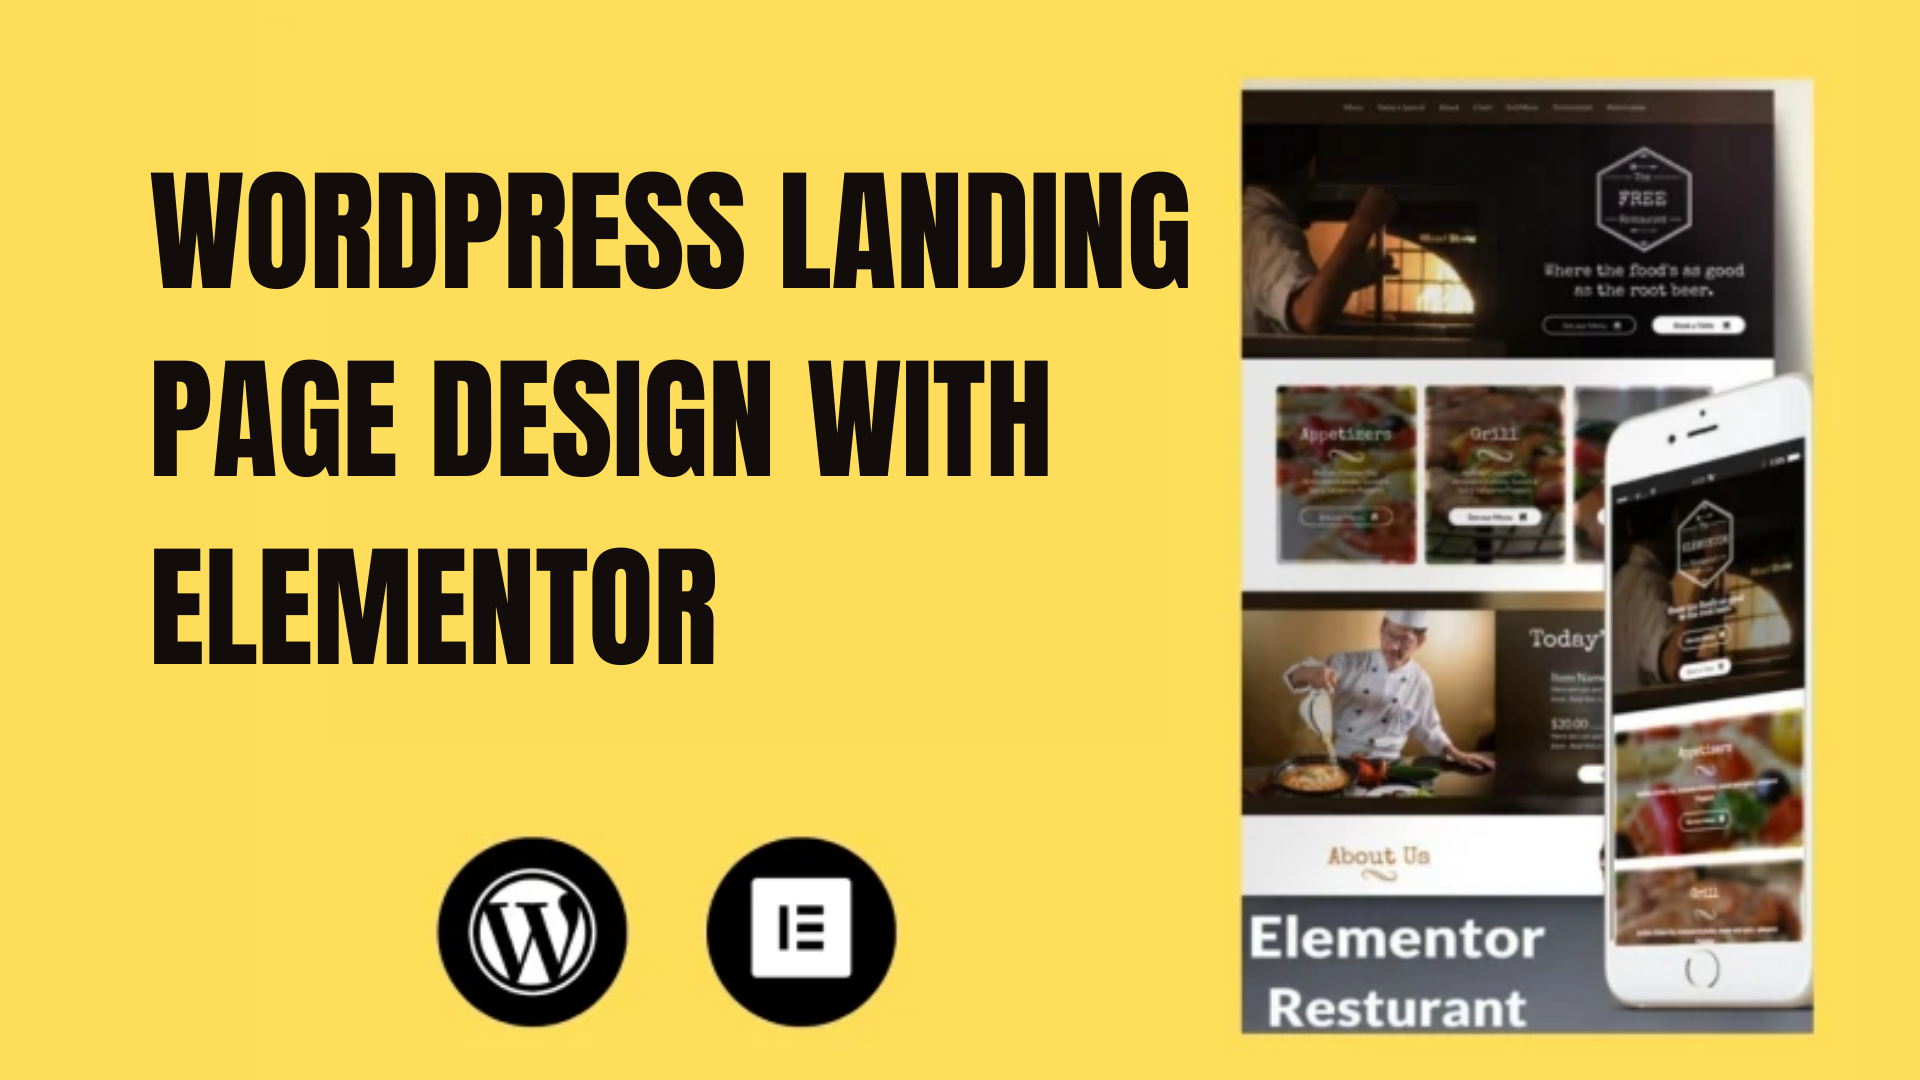 I will design modern wordpress landing page elementor and elementor pro landing page